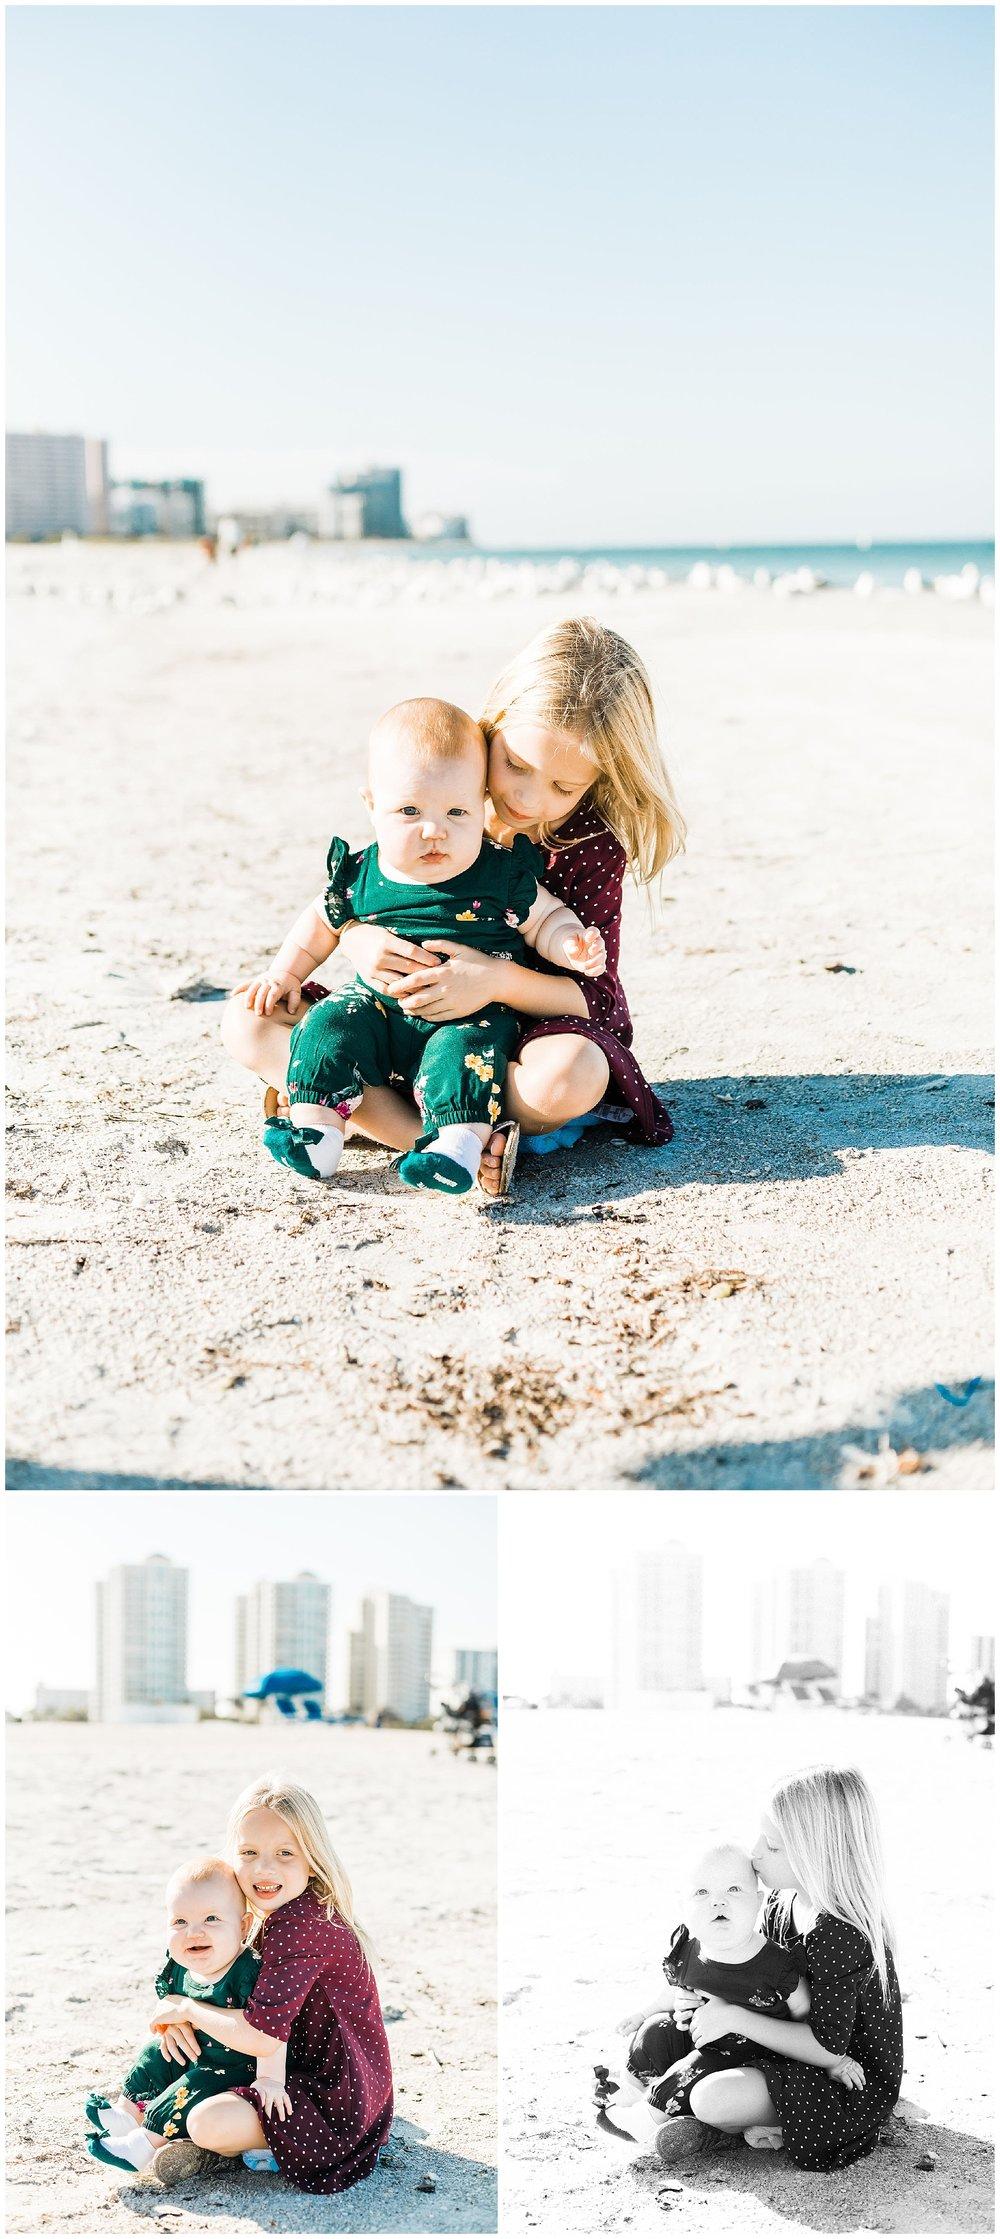 jessicafredericks_photography_family_beach_baby_clearwater_st pete beach_0017.jpg